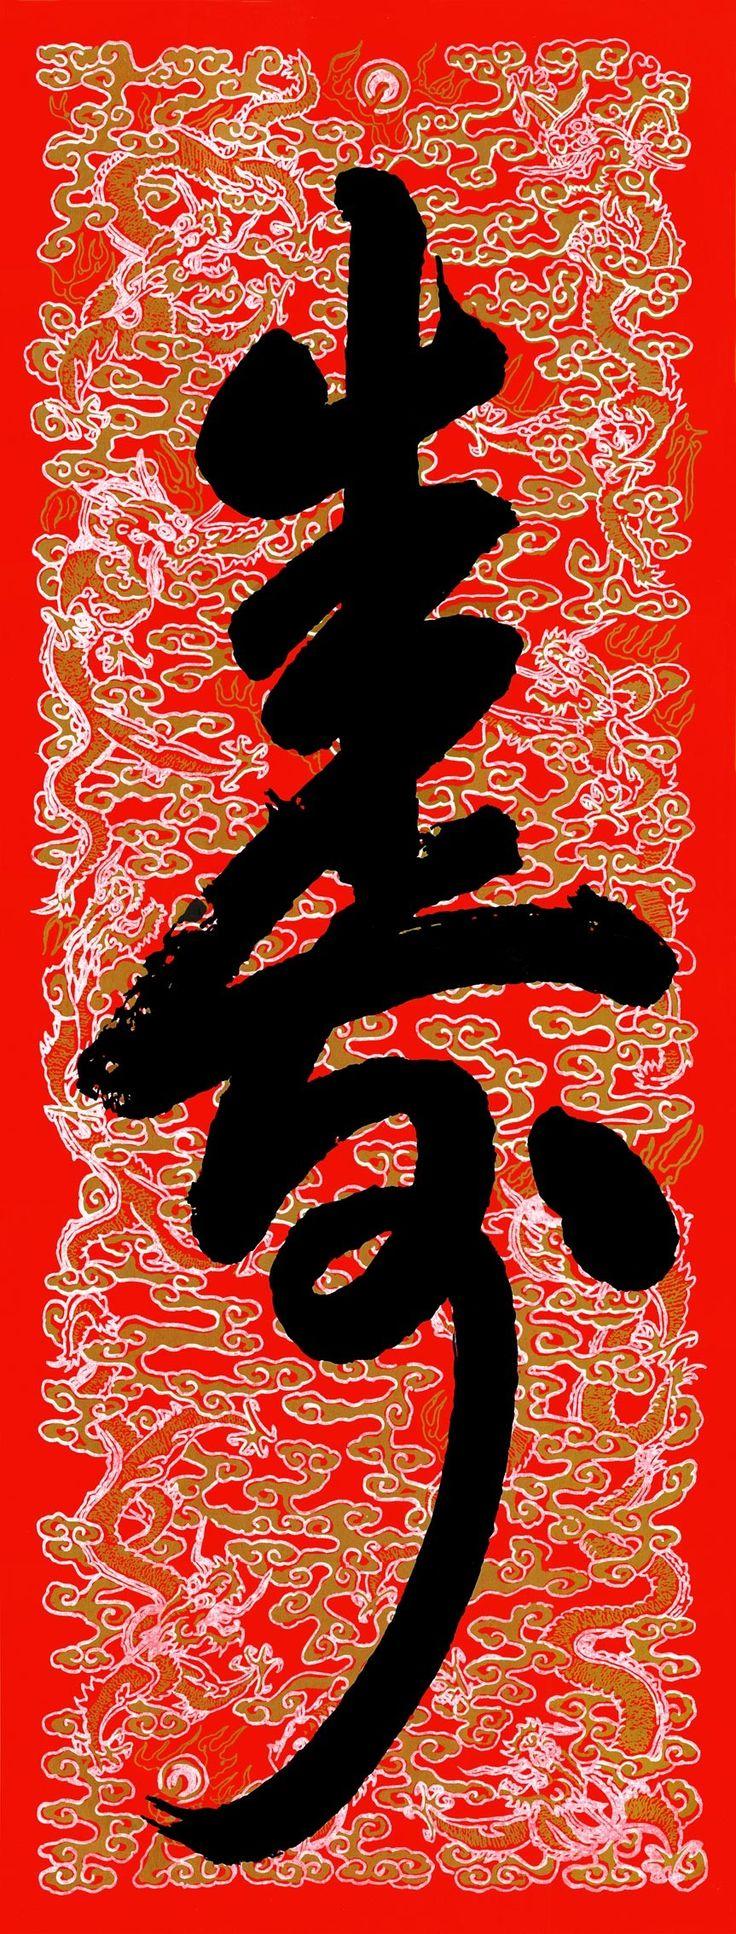 Qianlong Emperor(乾隆帝) 寿